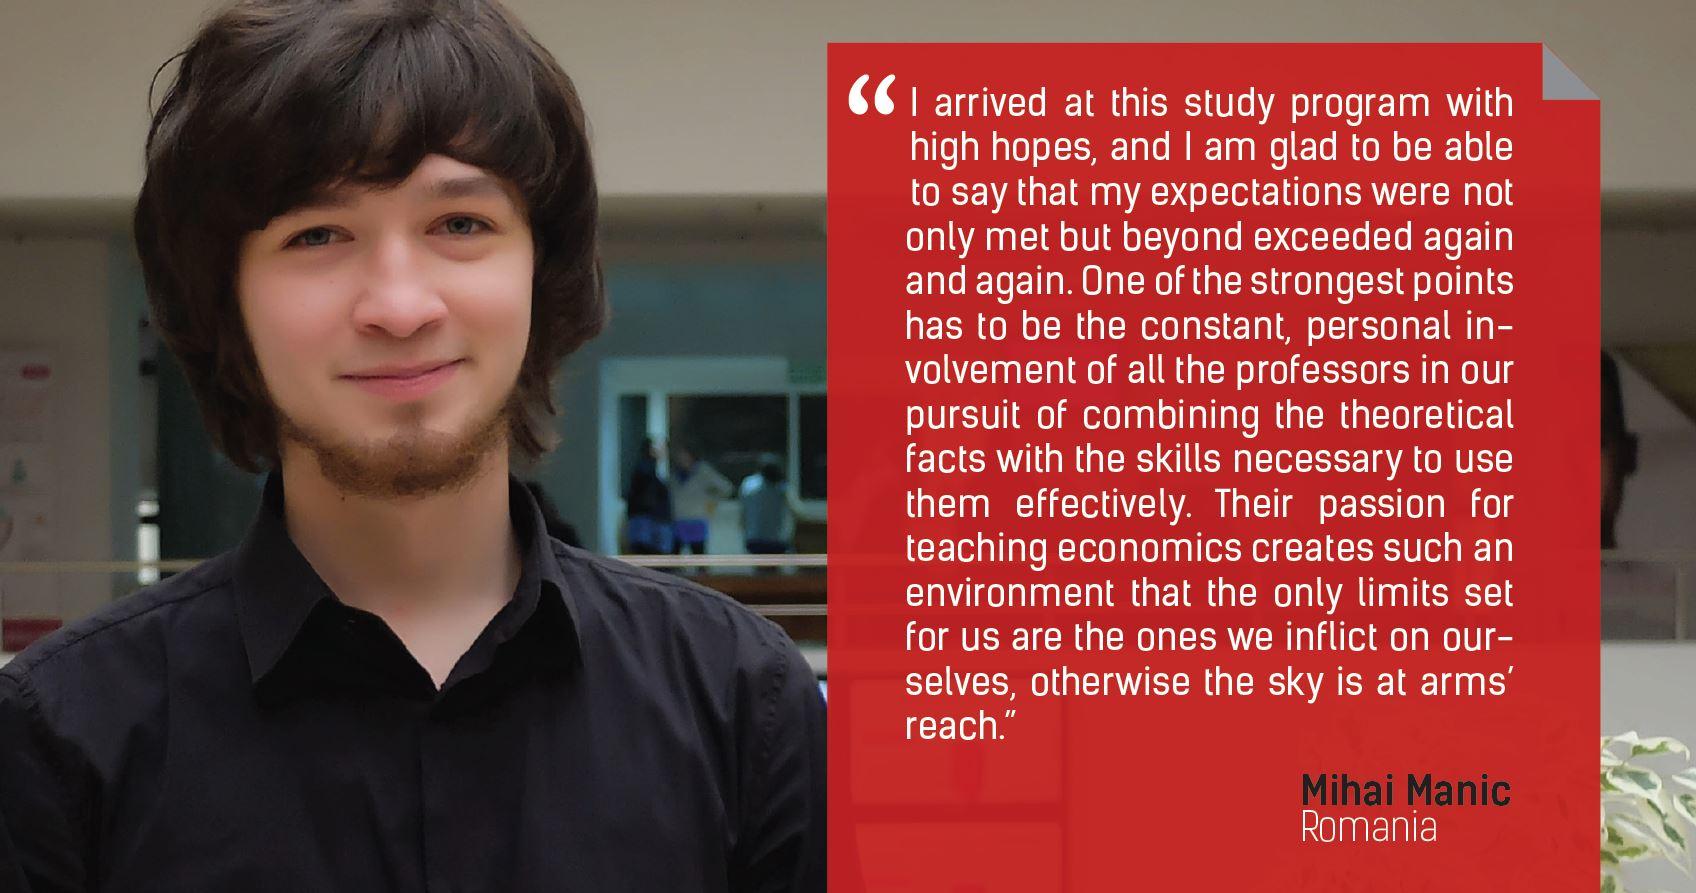 124210_124123_BAEnglish-InternationalBusinessandEconomics-Testimonial.jpg